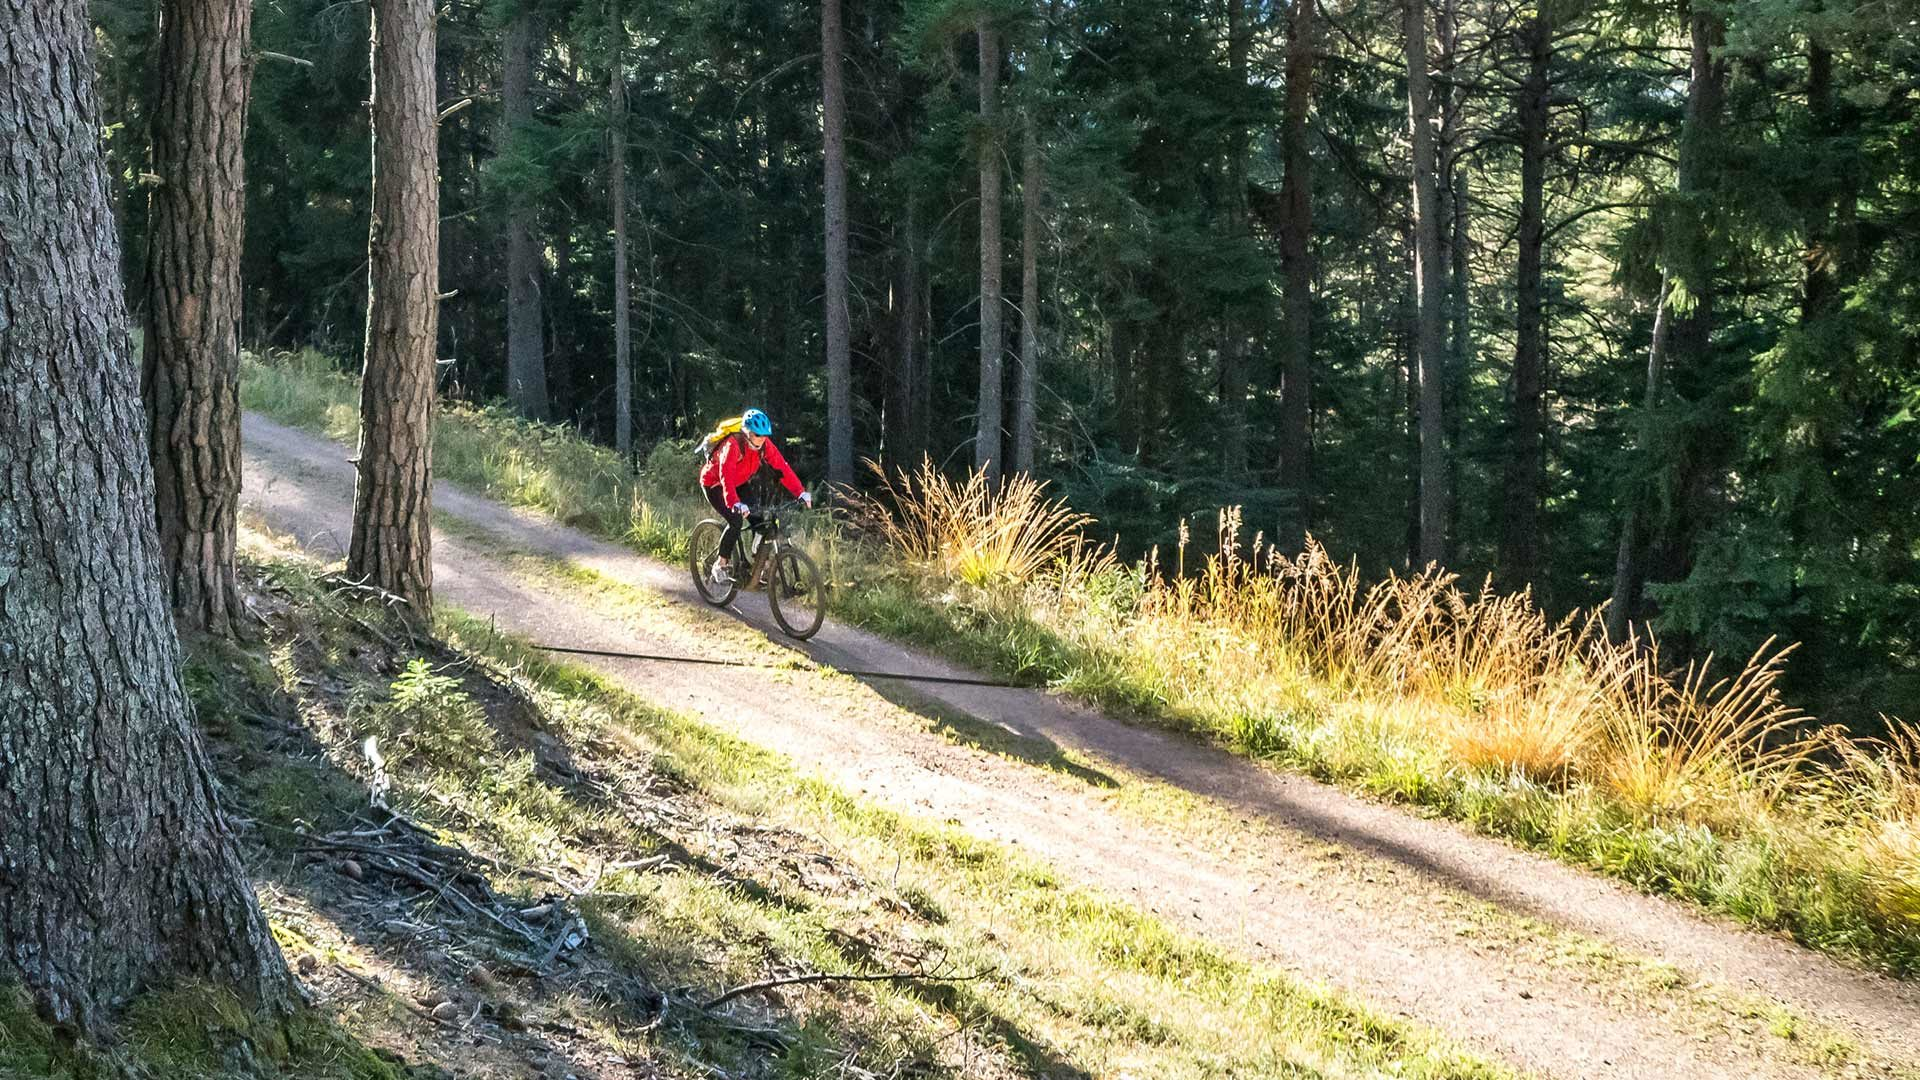 Giro in bicicletta alla Malga Fiecht